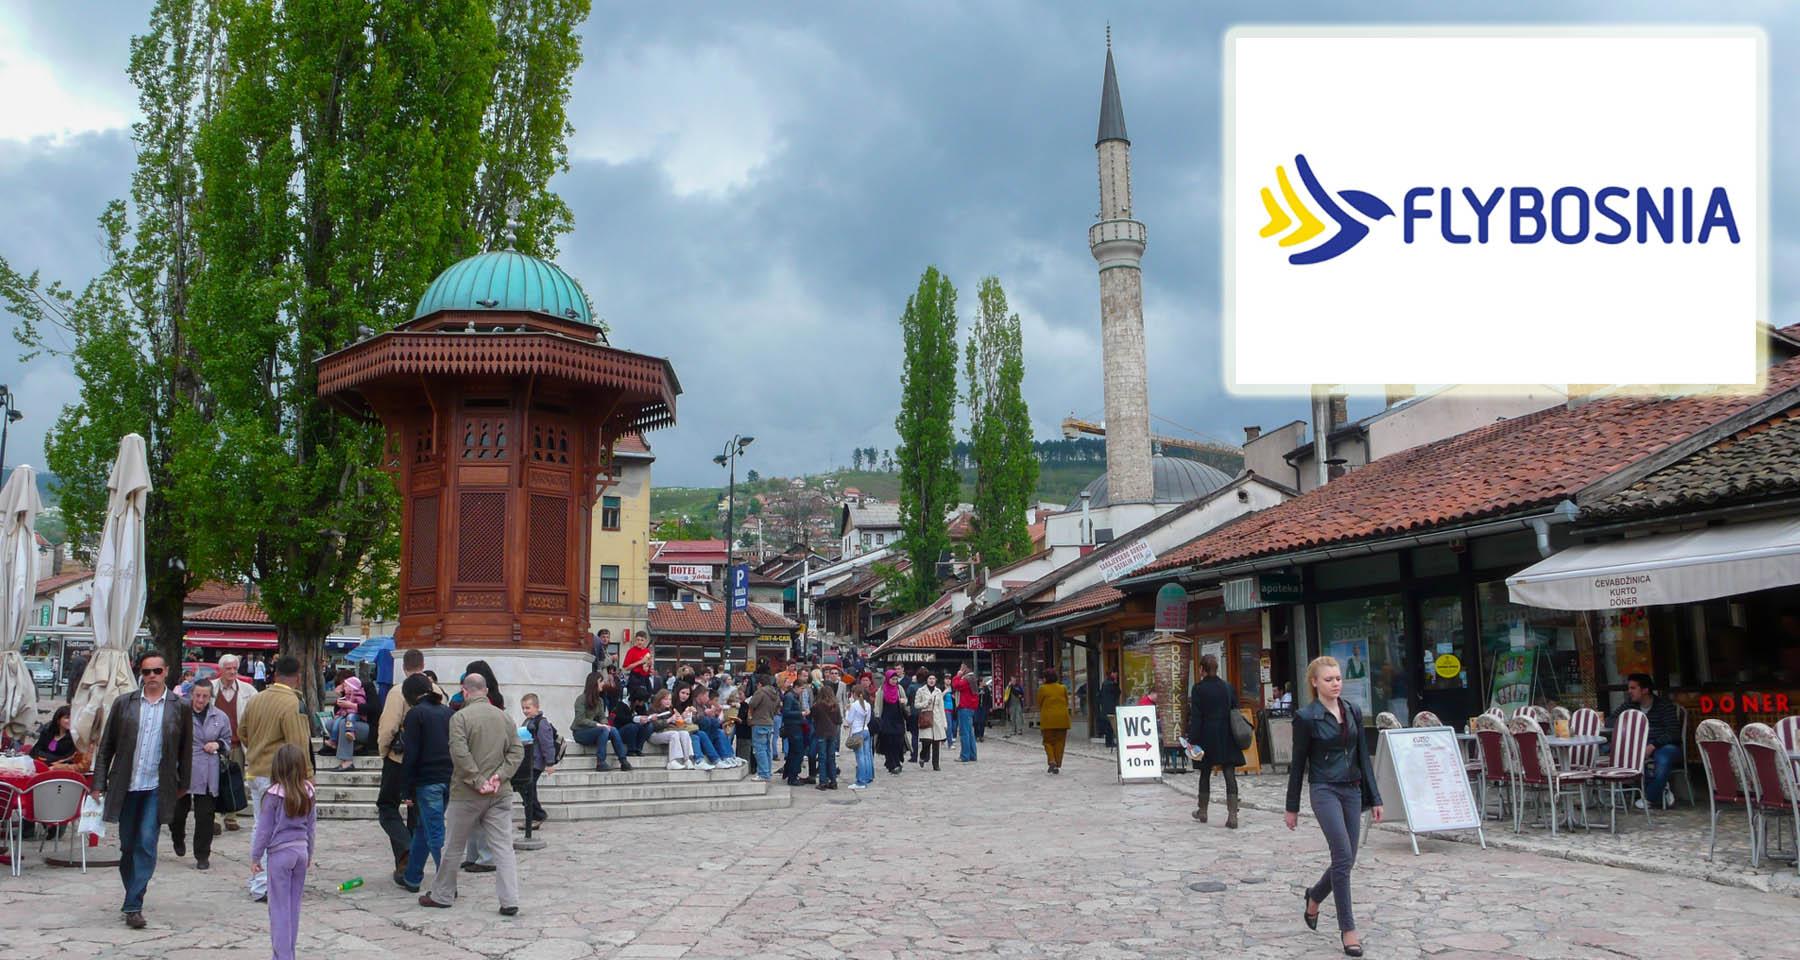 Will Sarajevo – Riyadh flights start today?